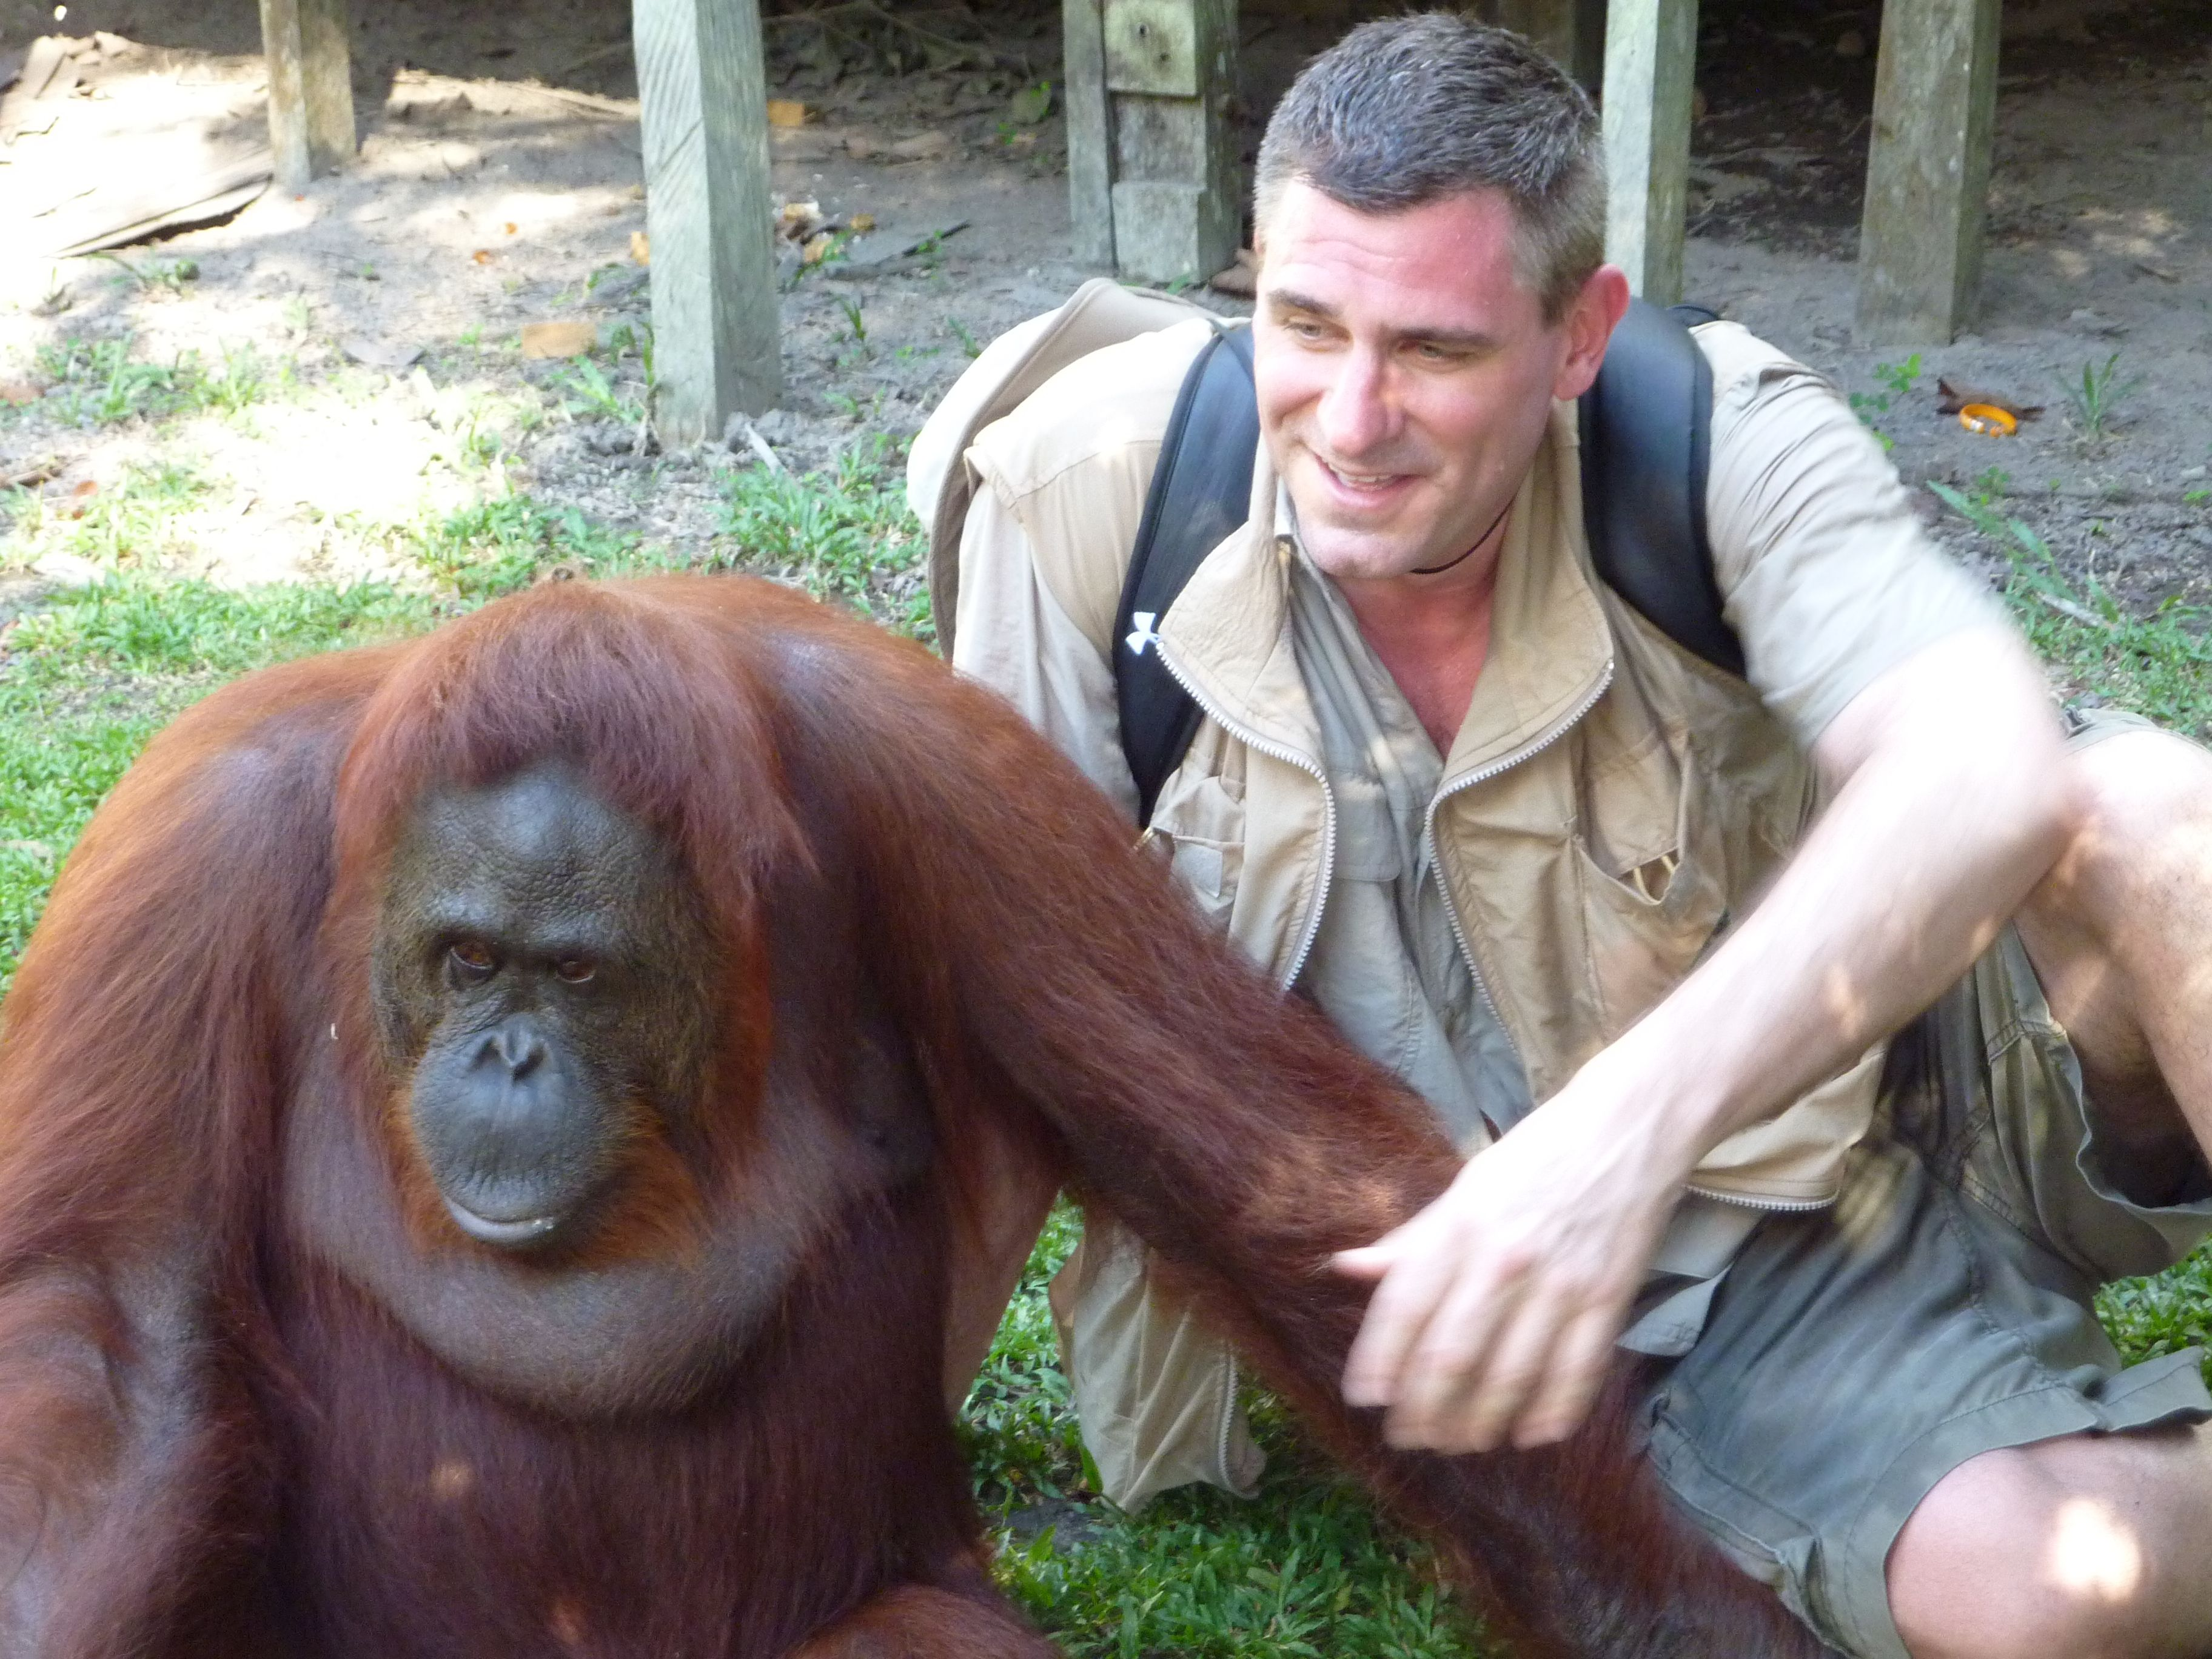 Jungle Joe Plays Ball with Local Wild Orangutan in Borneo